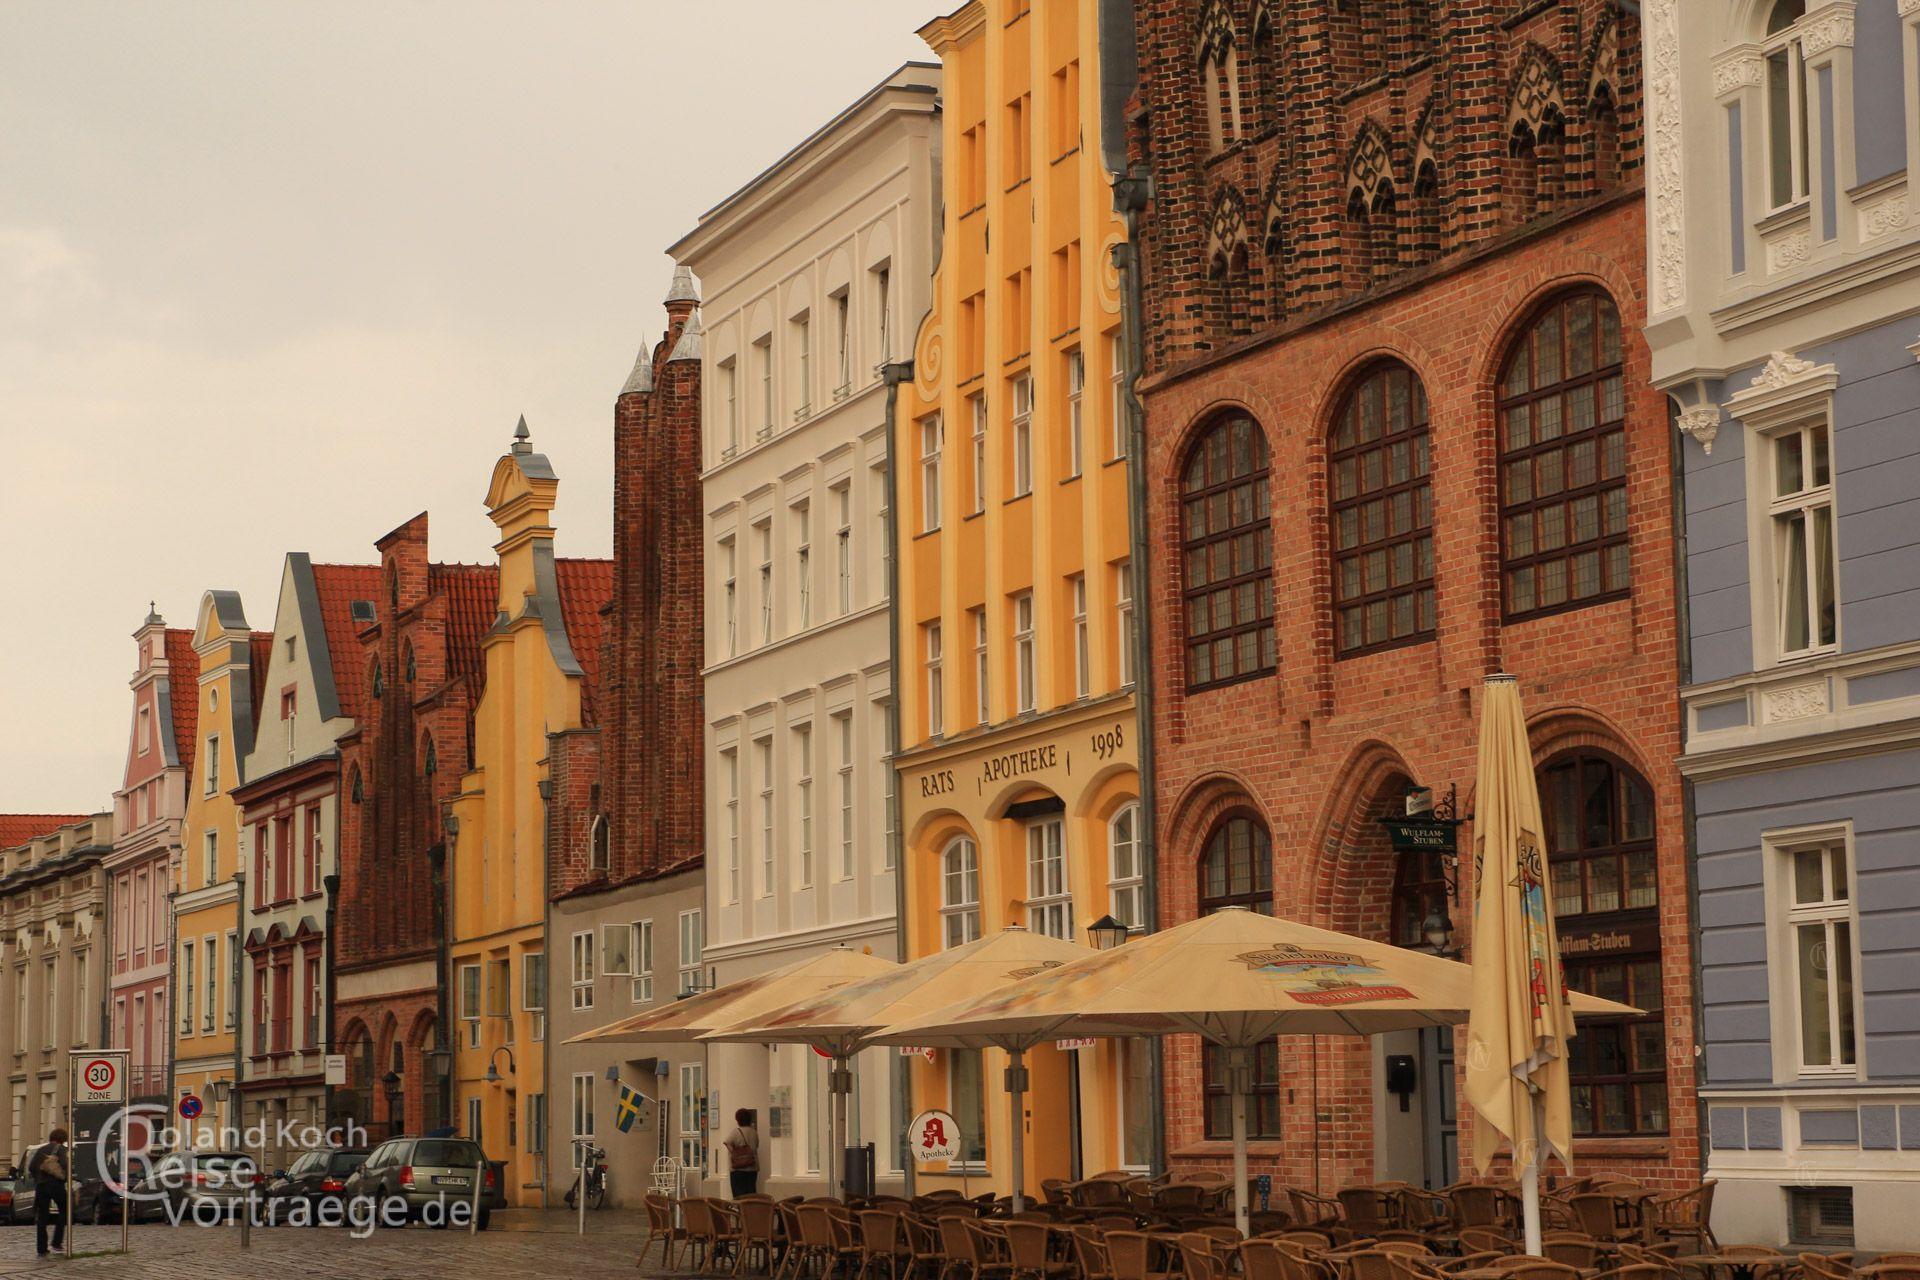 mecklenburg vorpommern essay Mecklenburg-vorpommerneu: distritu schloss schwerin mecklenburg & pomerania mecklenburg-vorpommern kasalungsungan yang makadake kareng.